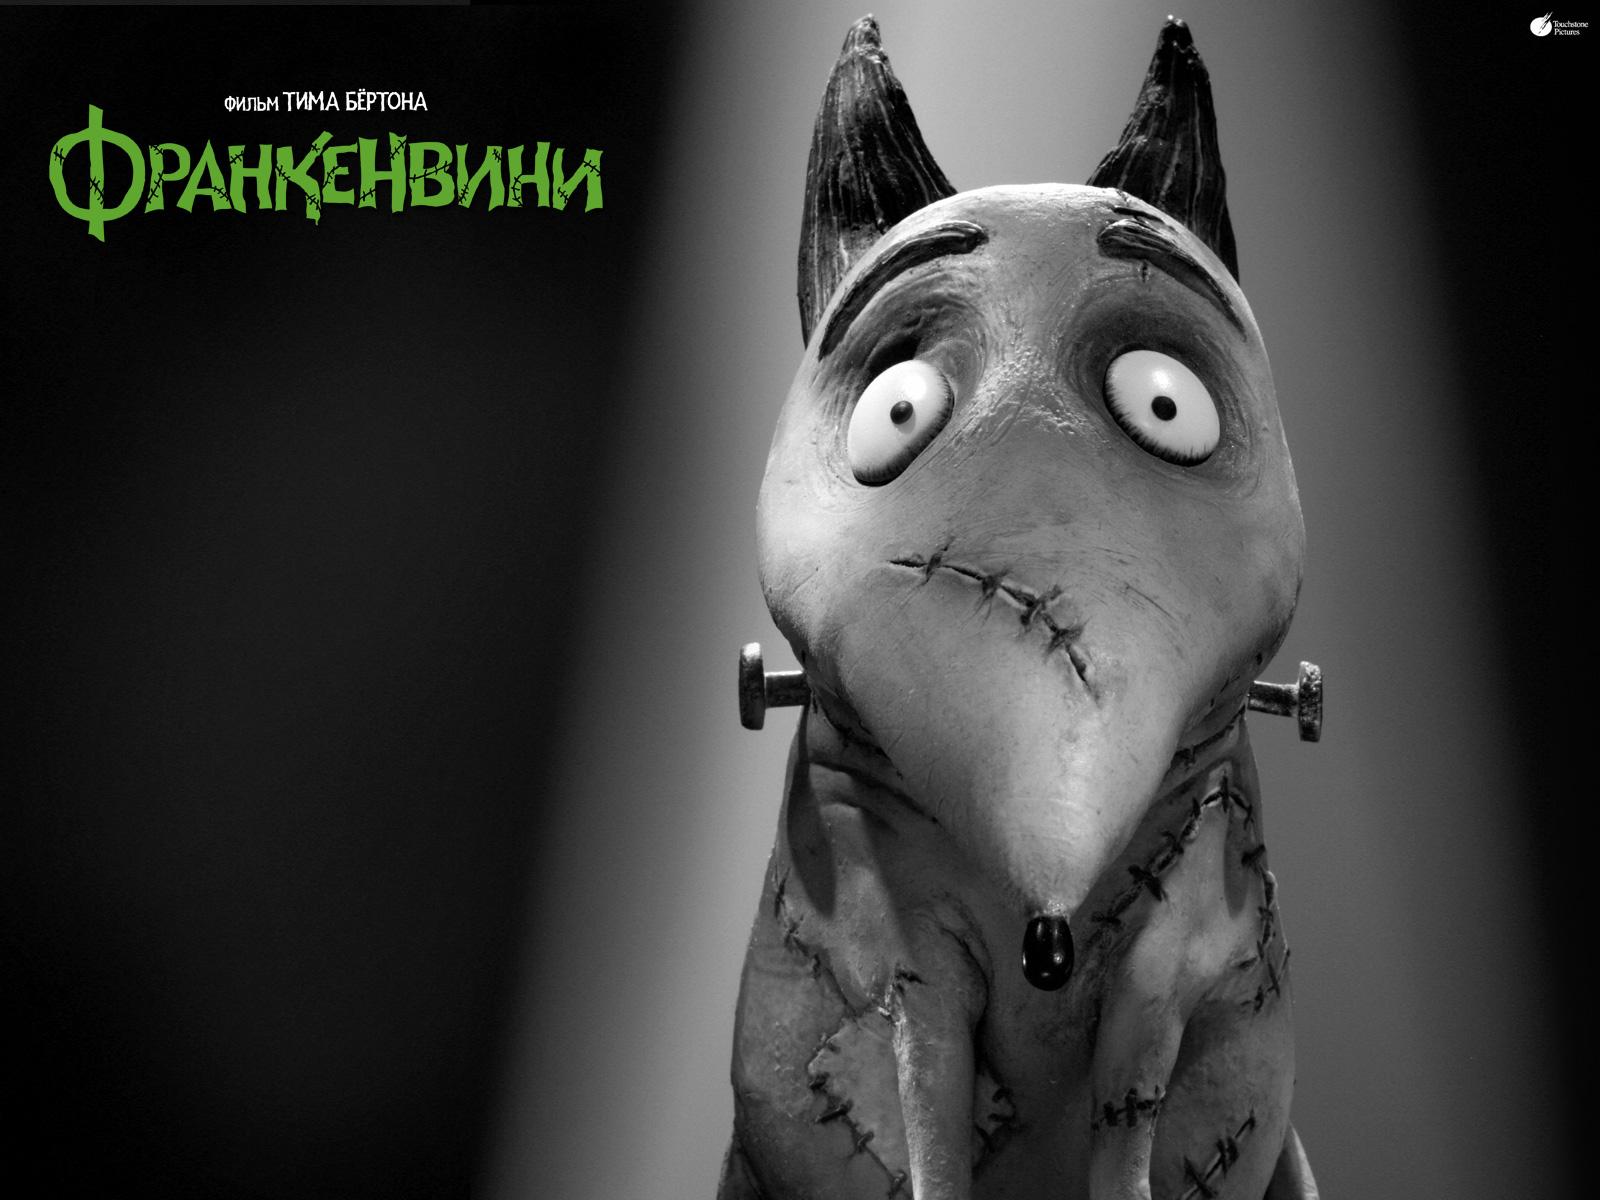 Frankenweenie Reviews - Metacritic Pictures of frankenweenie characters